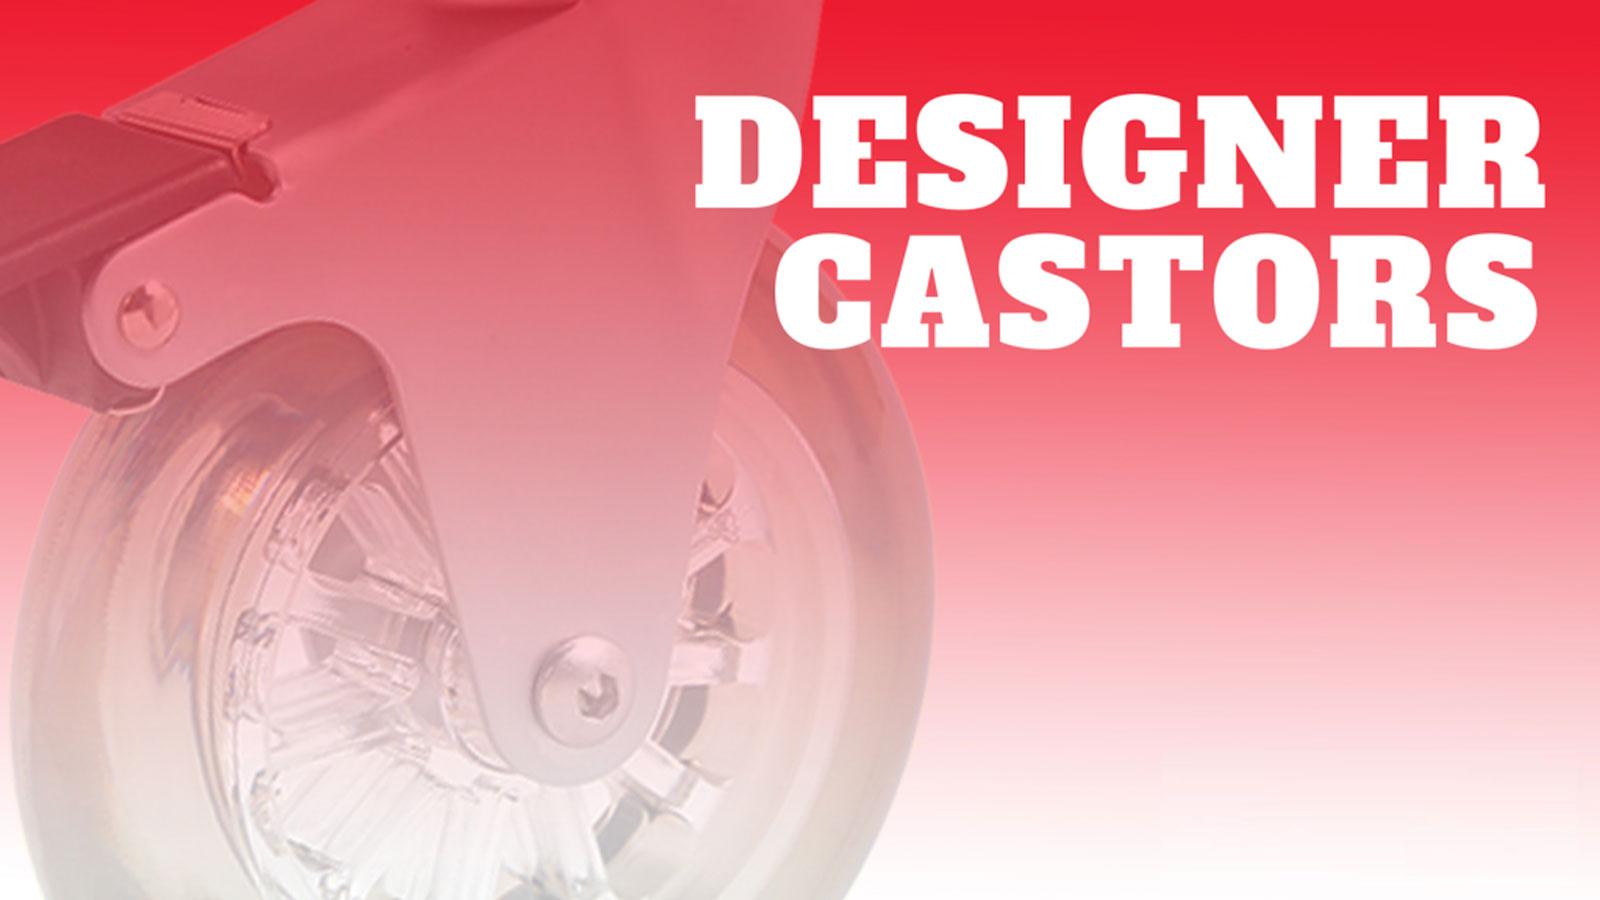 Castor-Designer